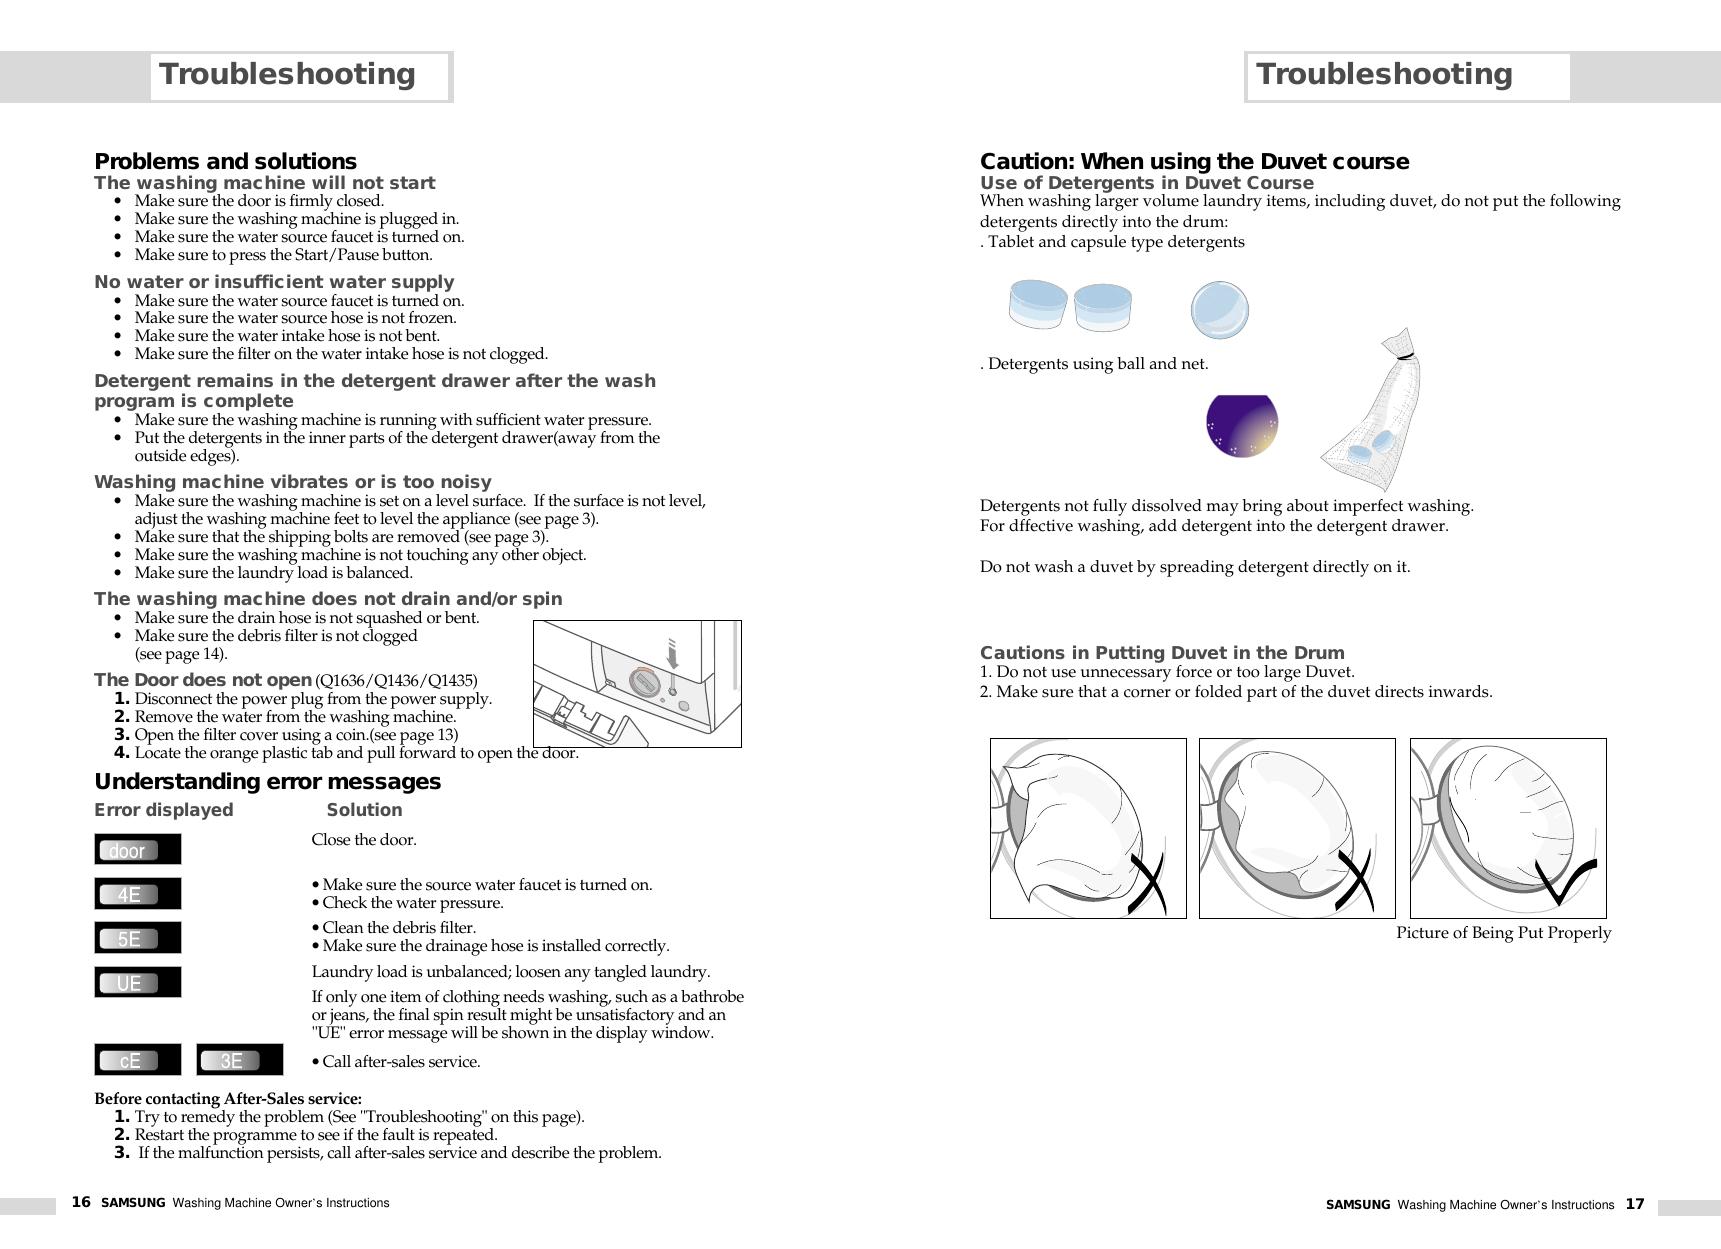 Samsung Q1235C S V Users Manual